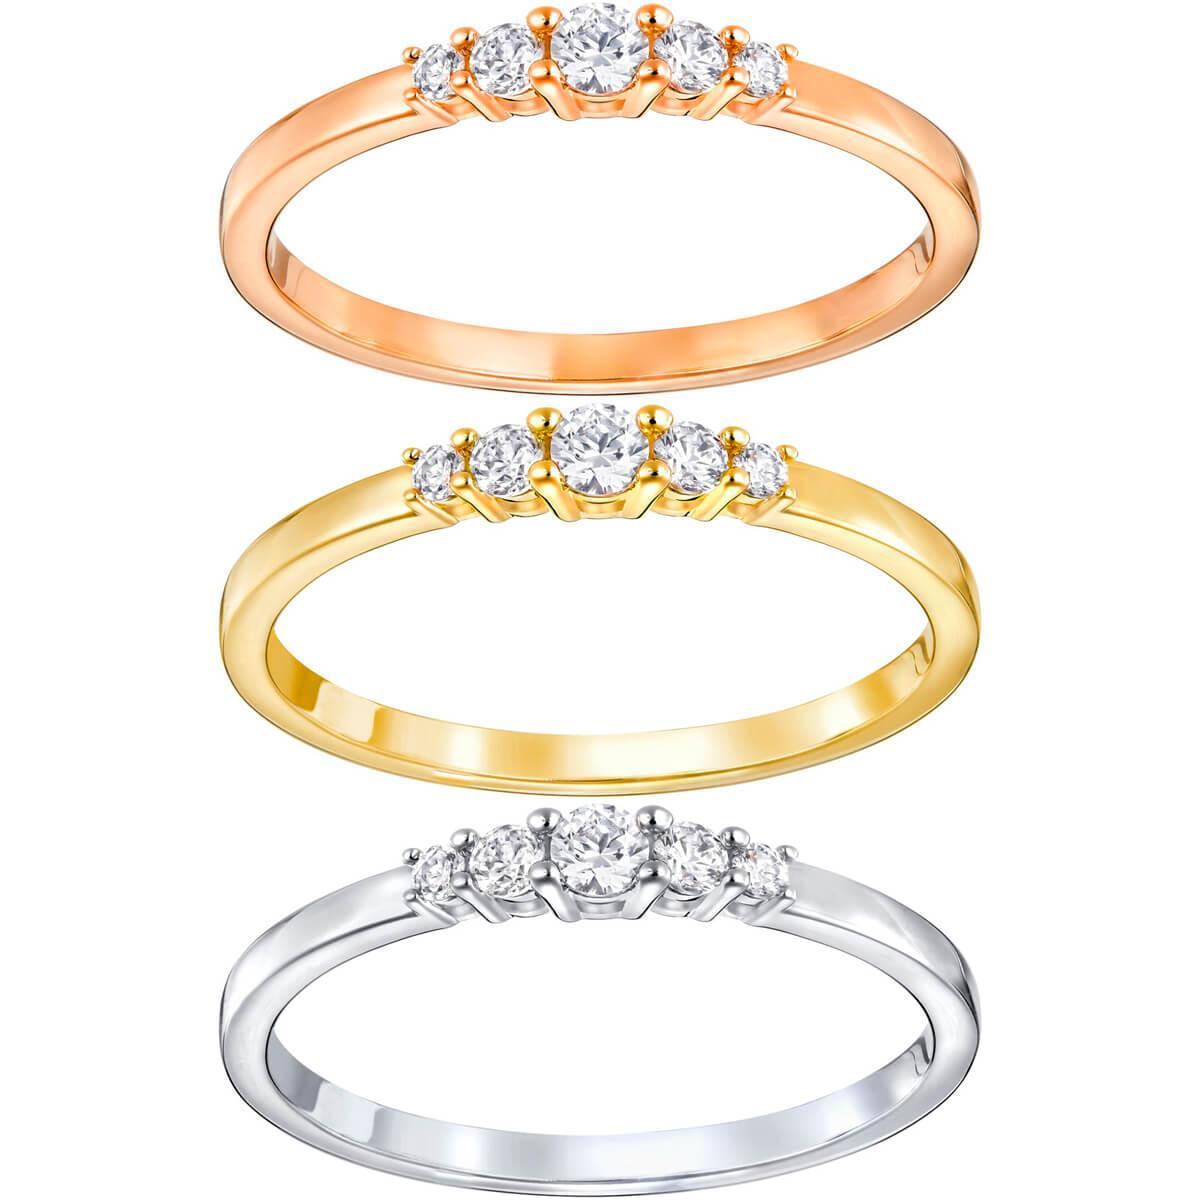 Lyst - Swarovski Frisson Ring Set in Metallic 2672e67cf094